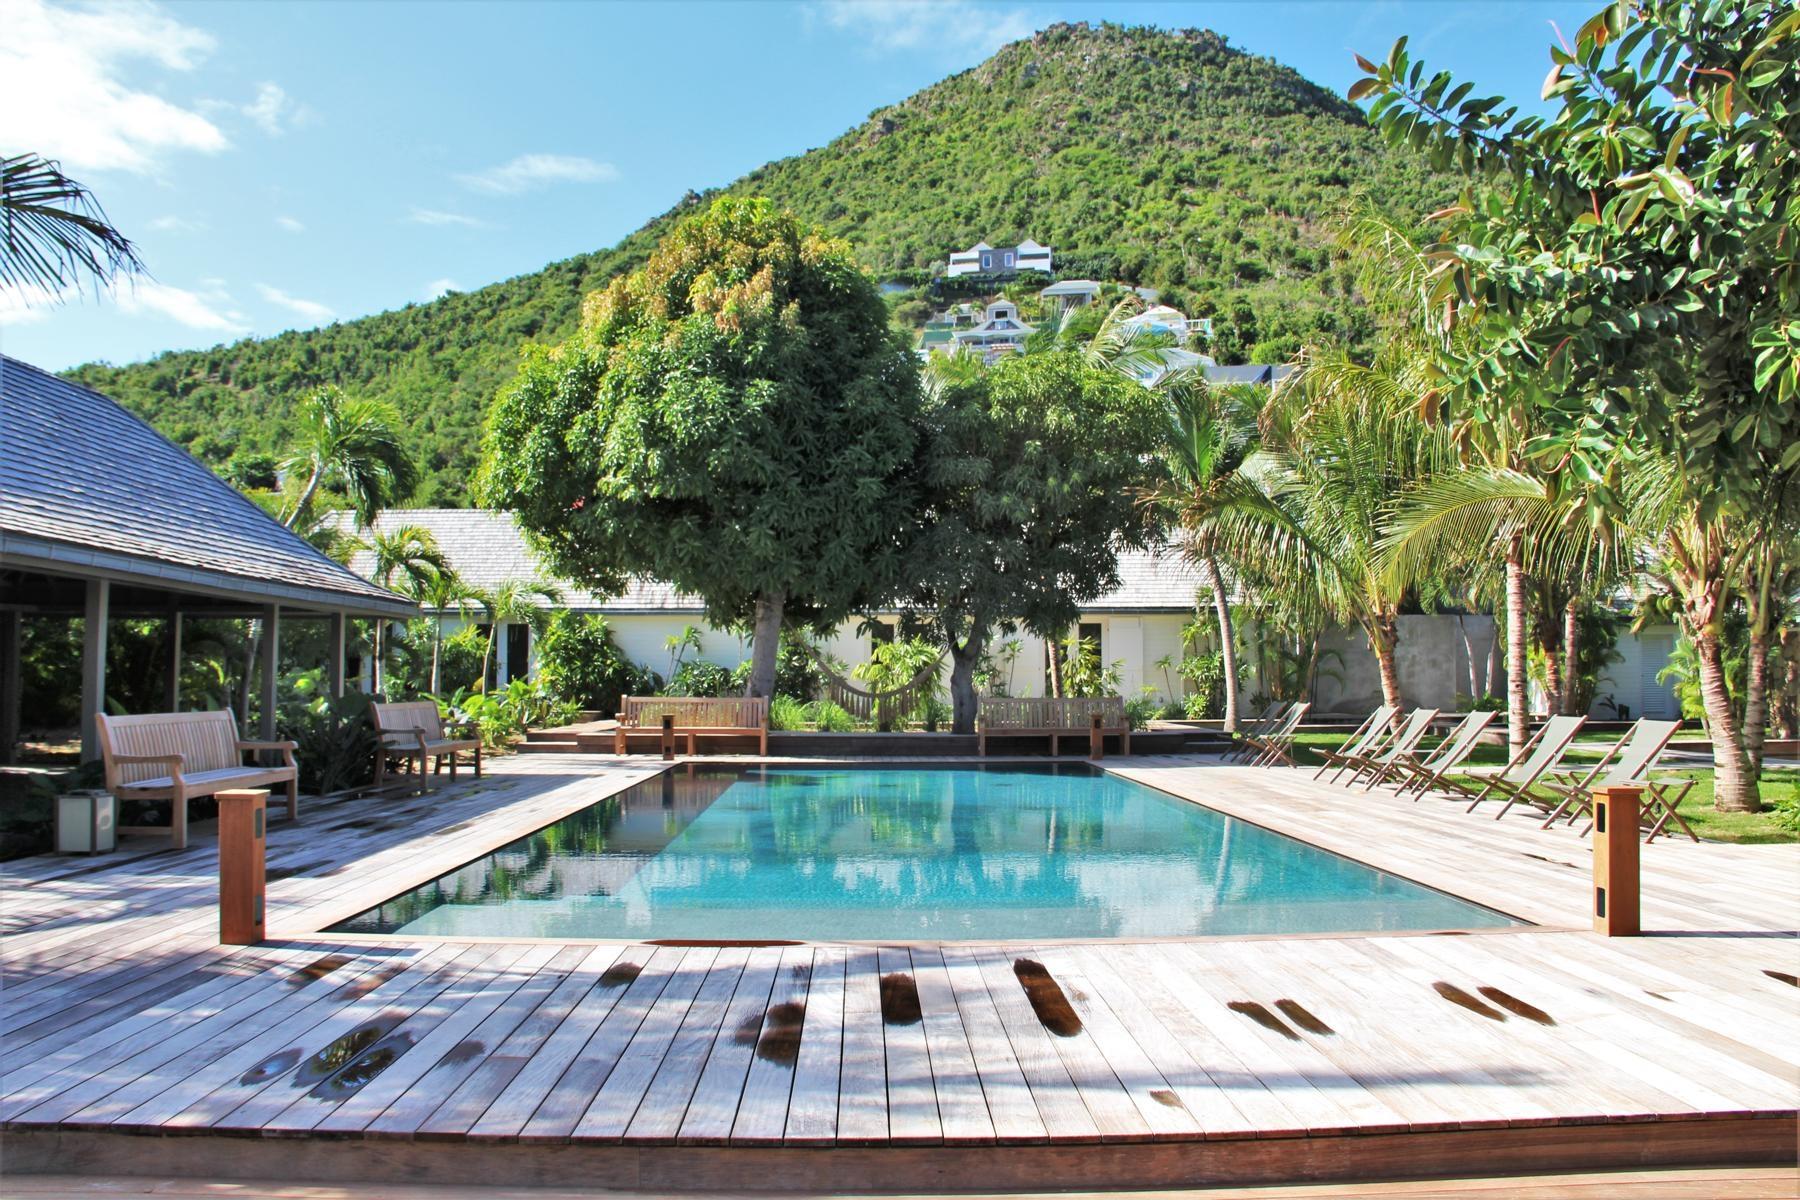 Luxury villa rentals caribbean - St barthelemy - Lorient - No location 4 - le Manoir Voltaire - Image 1/29